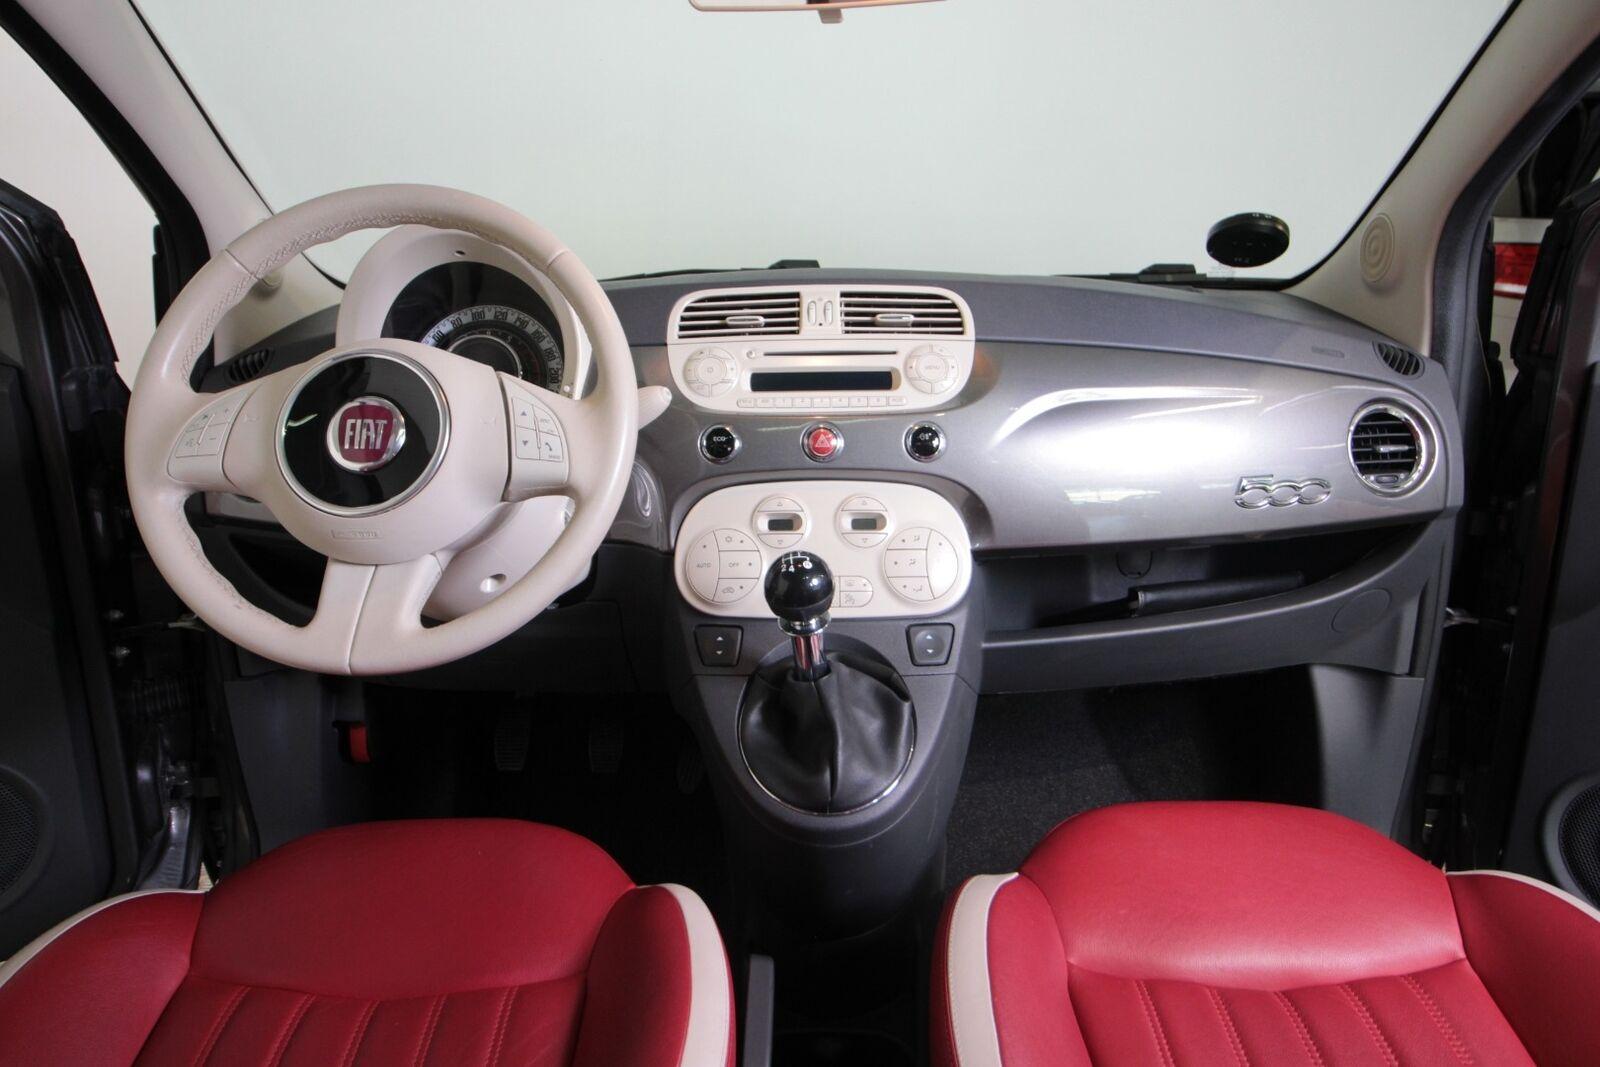 Fiat 500 TwinAir 80 Fashion